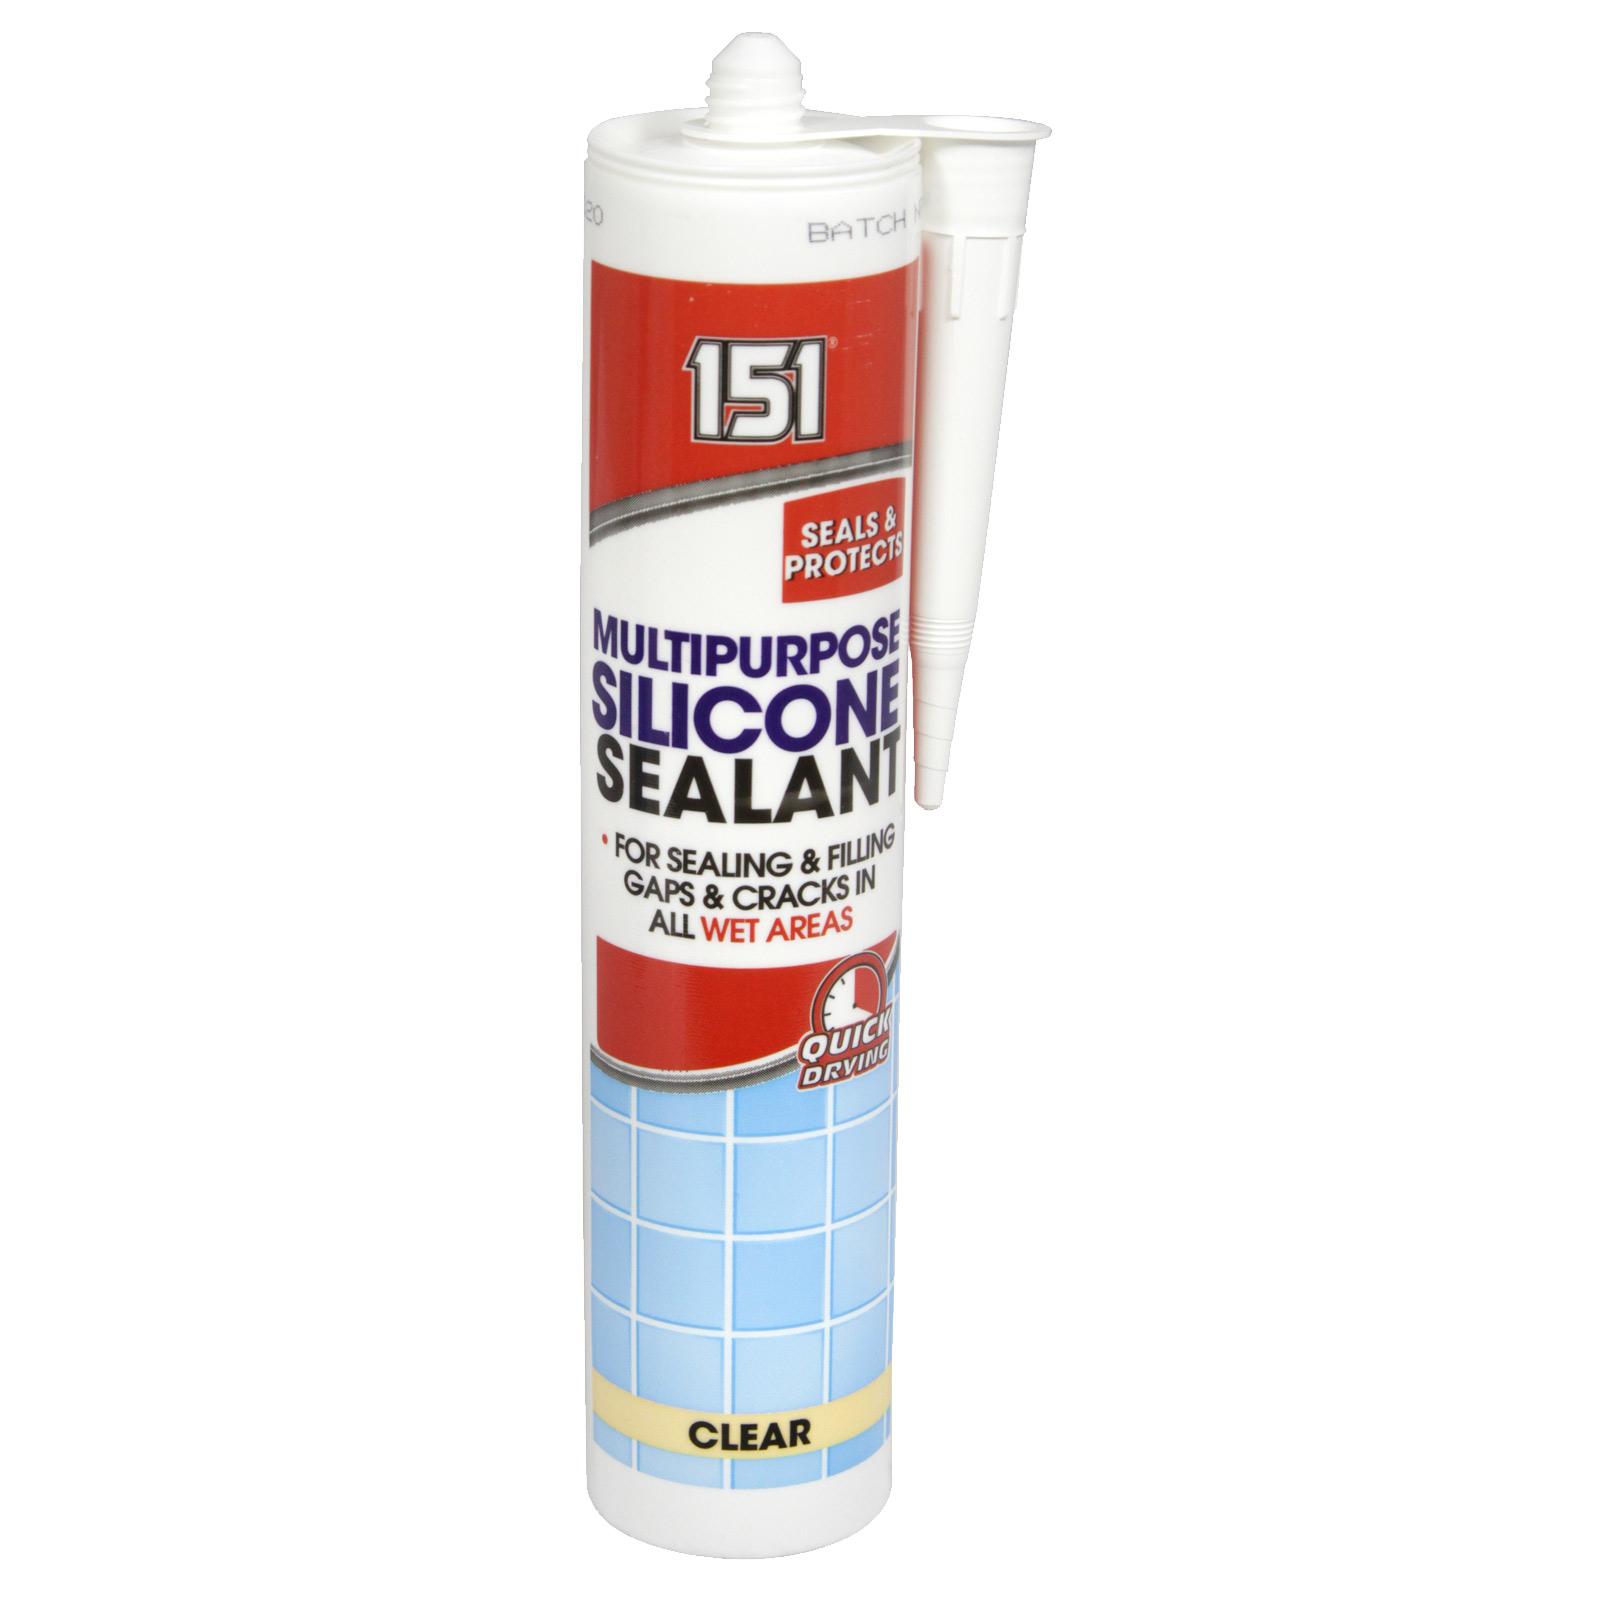 151 MULTI PURPOSE SILICONE SEALANT 280ML CARTRIDGE CLEAR